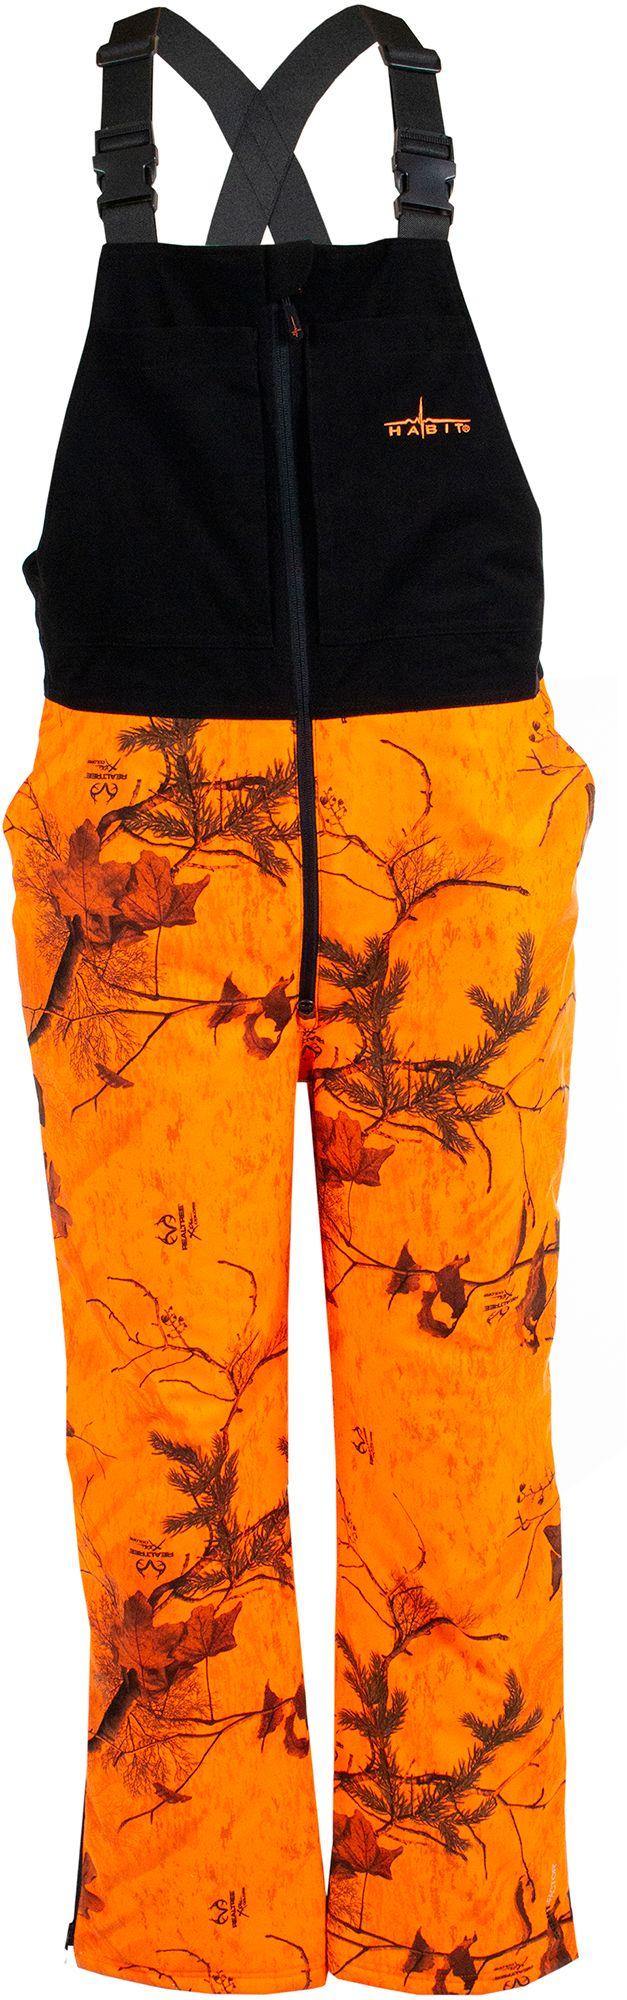 Habit Men's Cedar Branch Insulated Waterproof Hunting Bib, Medium, Blaze Orange/black